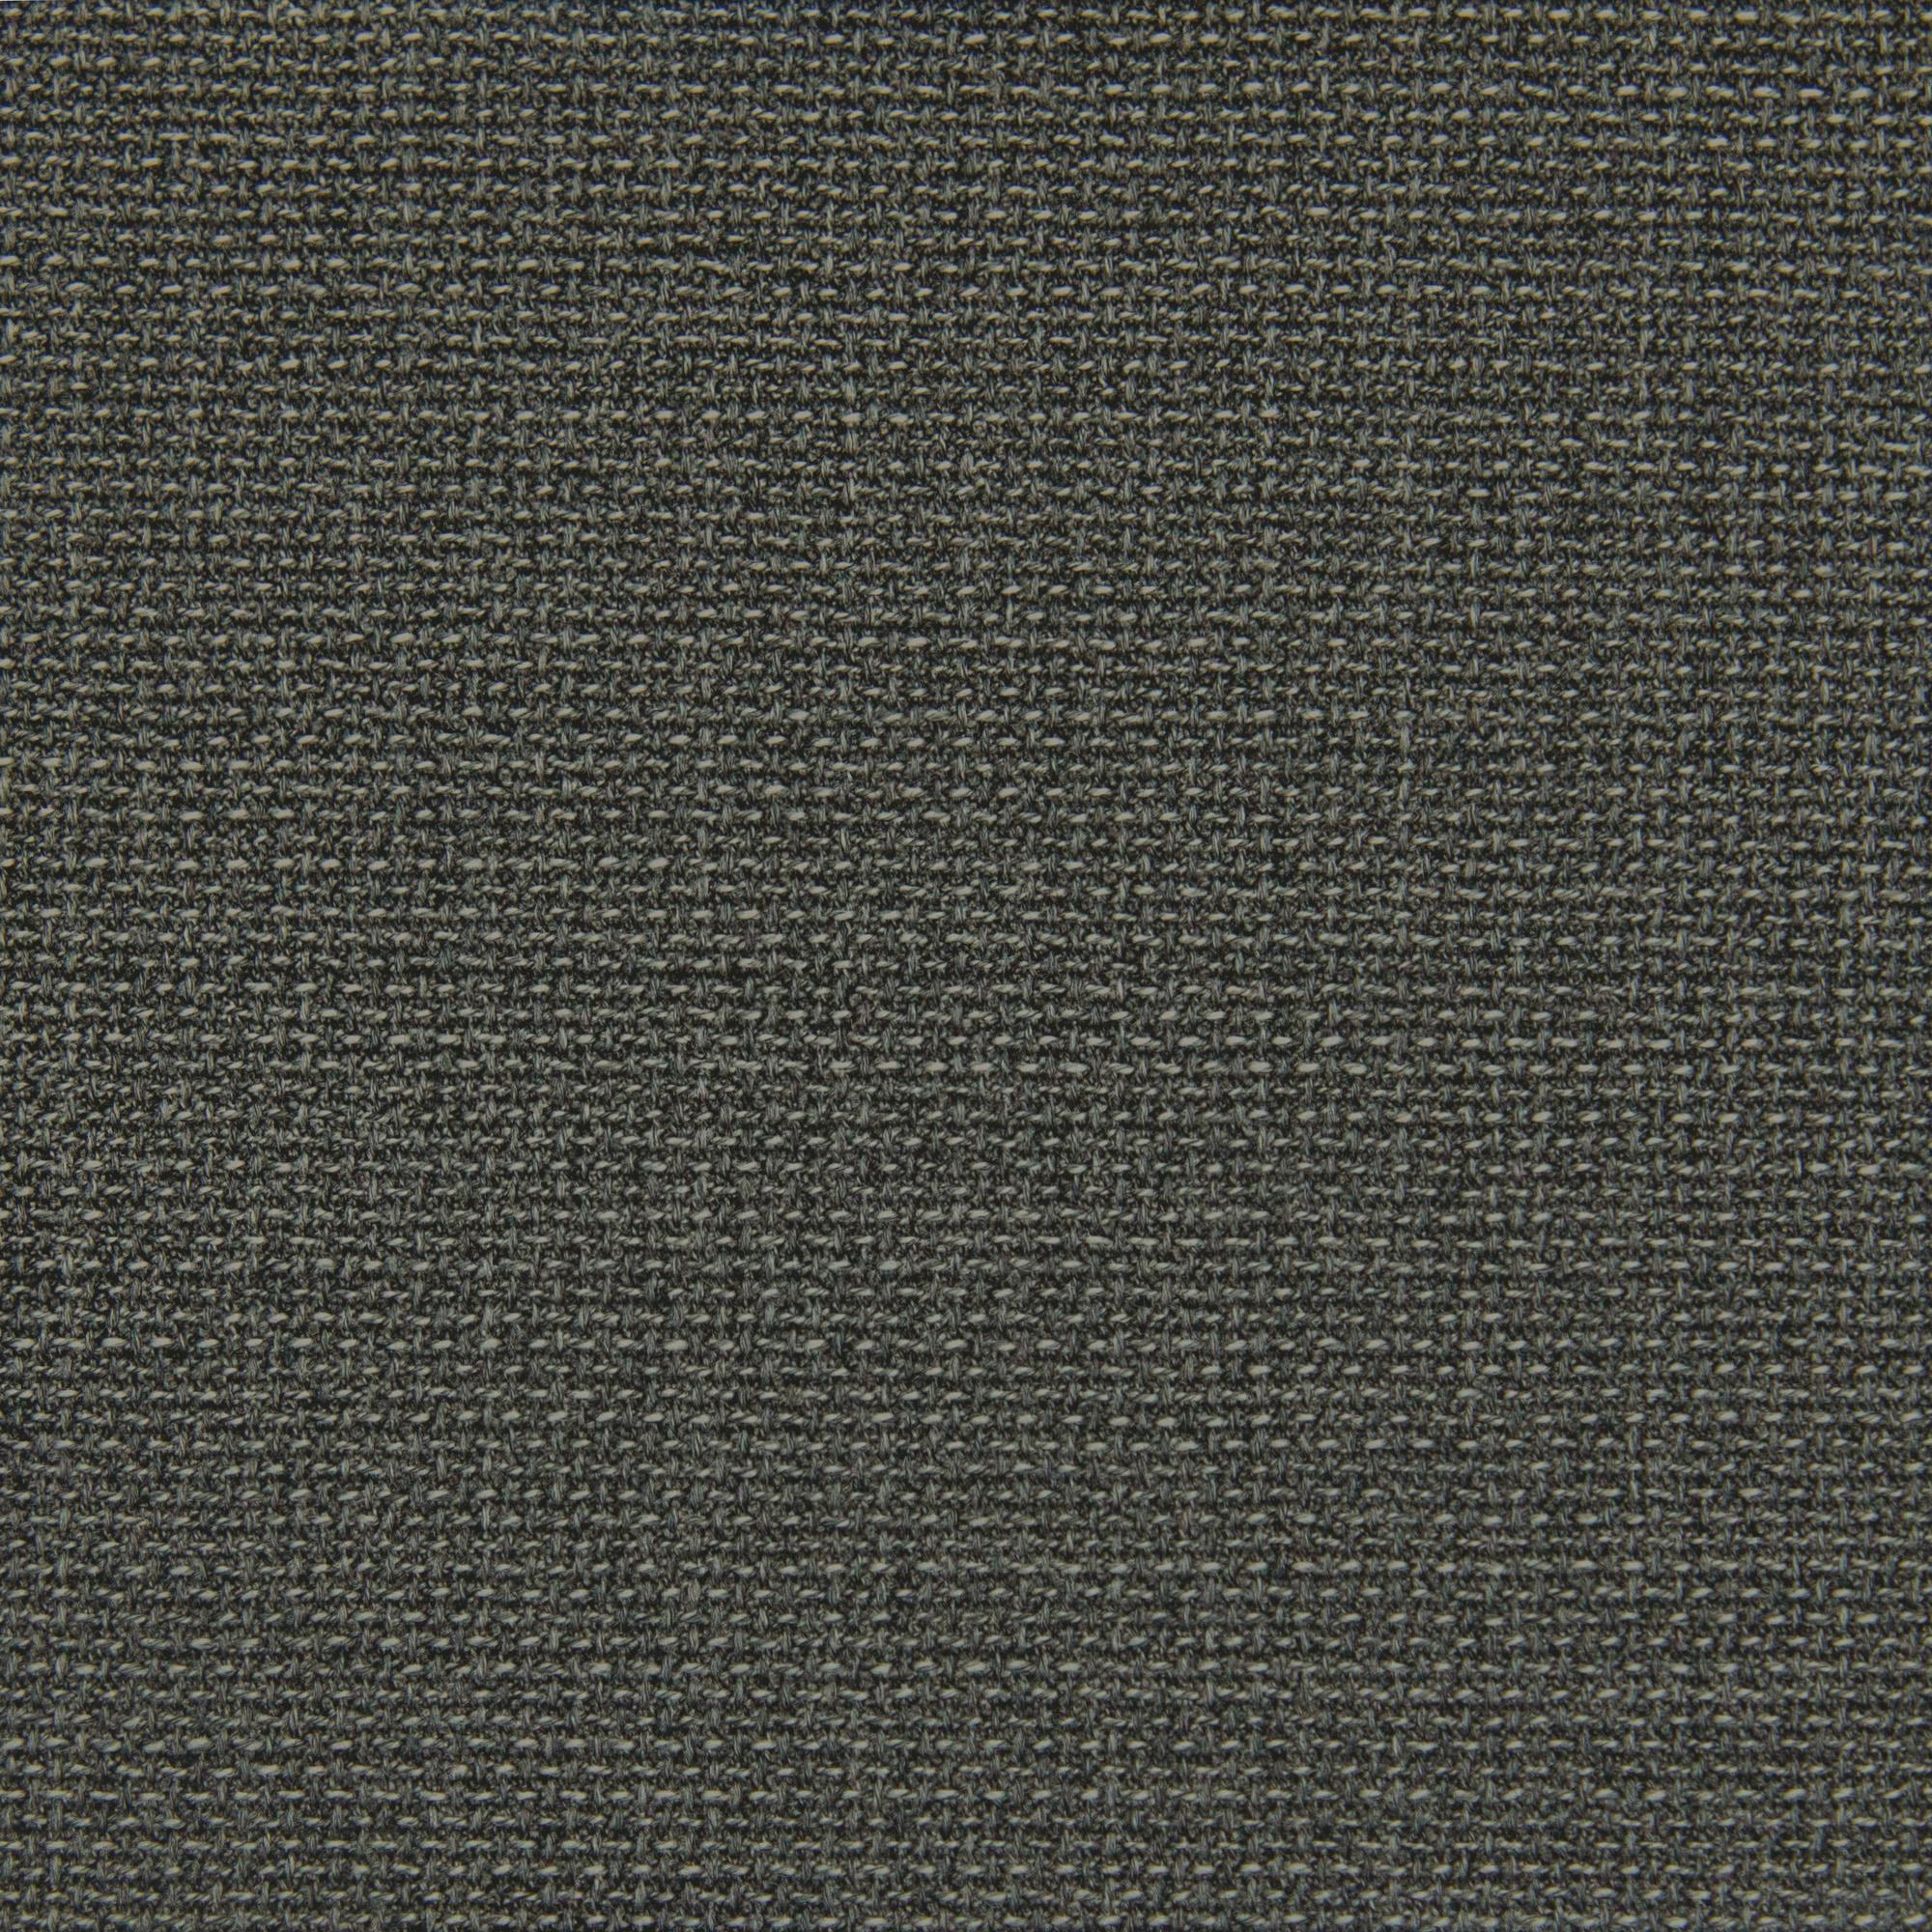 Sz1713010 1